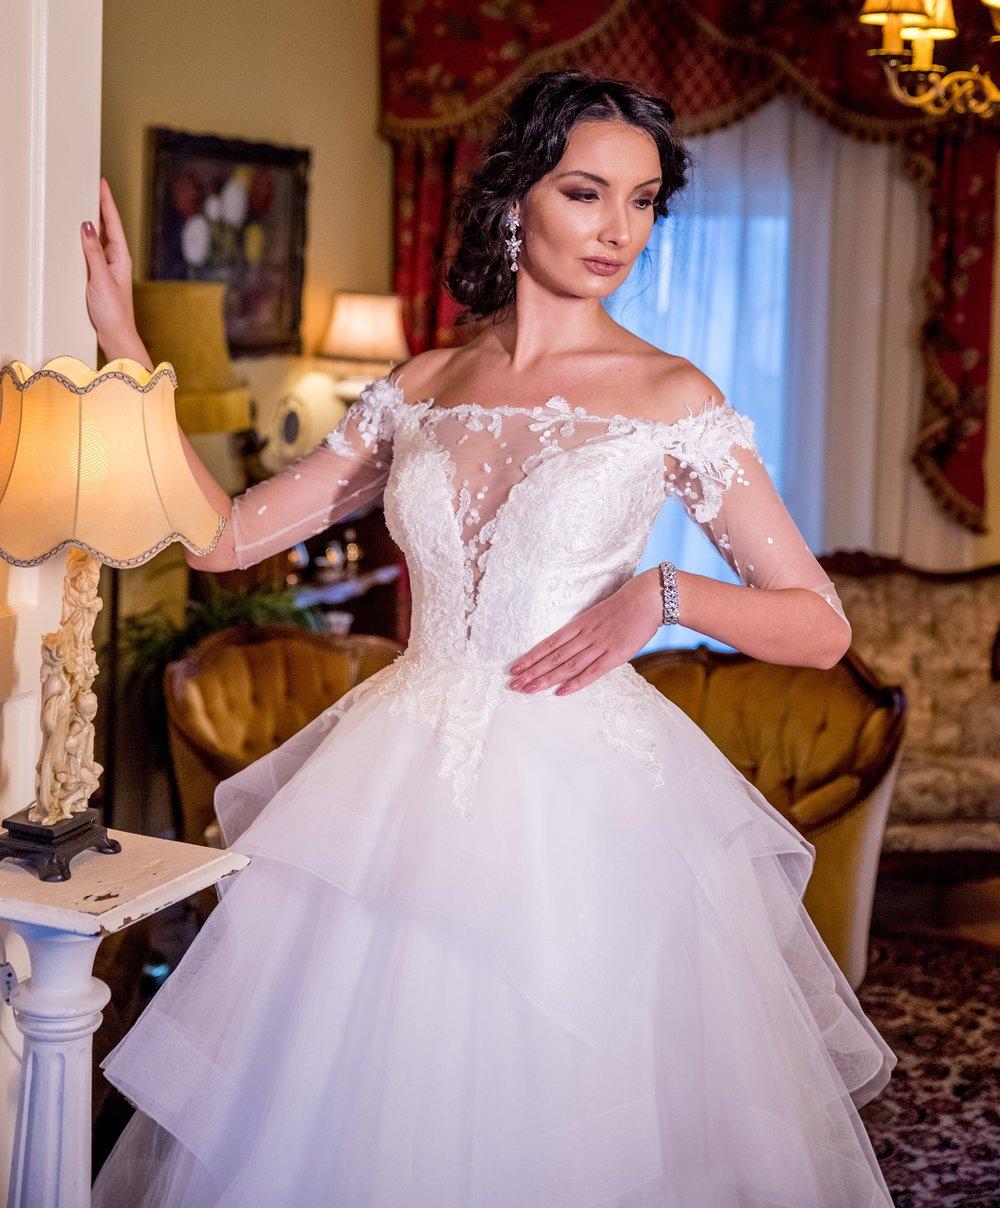 2018 wedding dresses fashion by laina (61).jpg